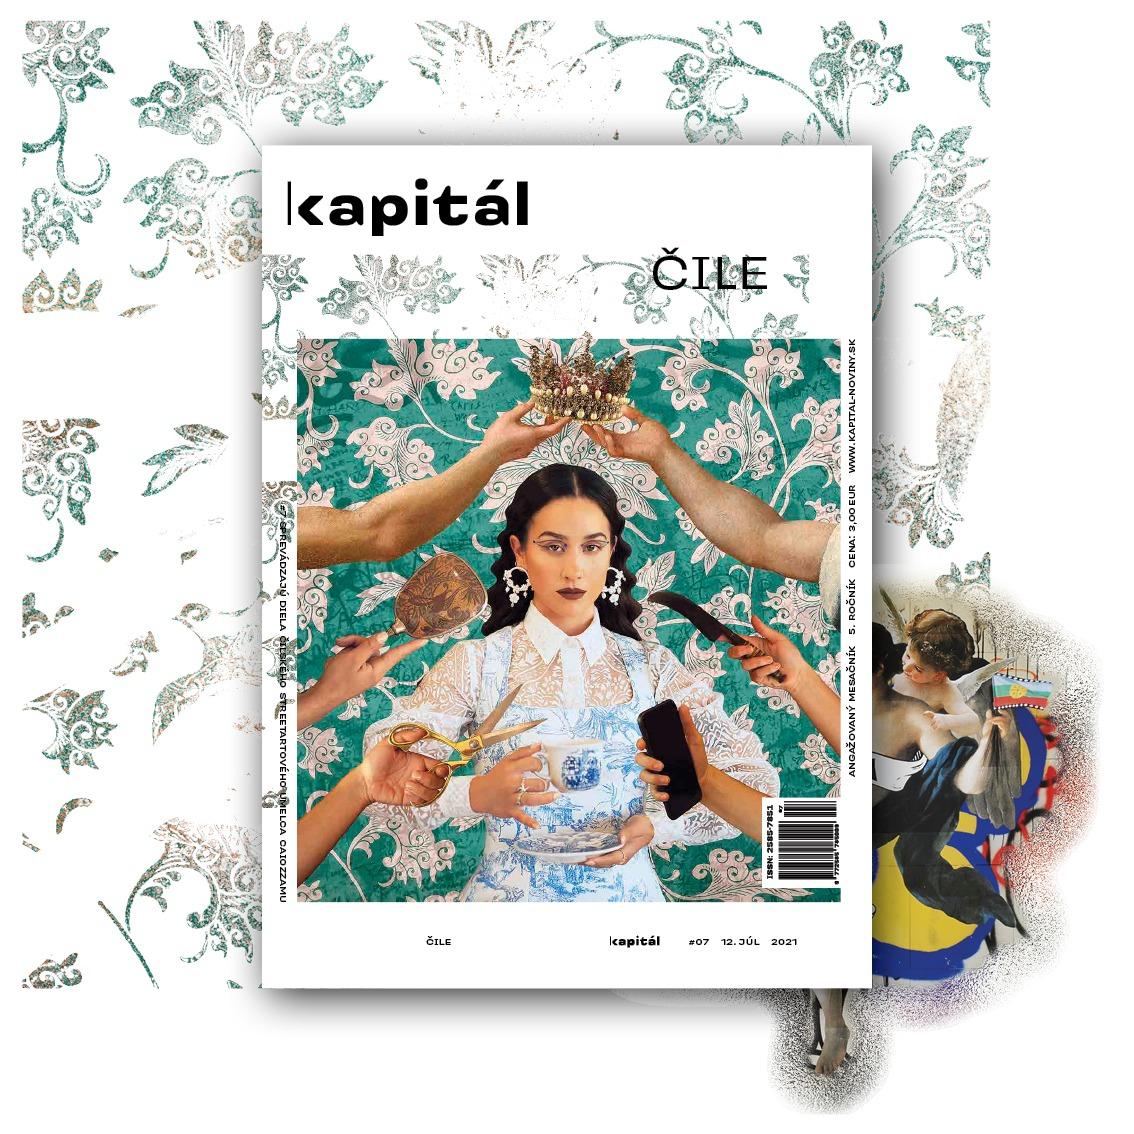 https://kapital-noviny.sk/wp-content/uploads/2021/07/2107_KAPITAL_07_CILE_WEB_PROFILOVKA.jpg